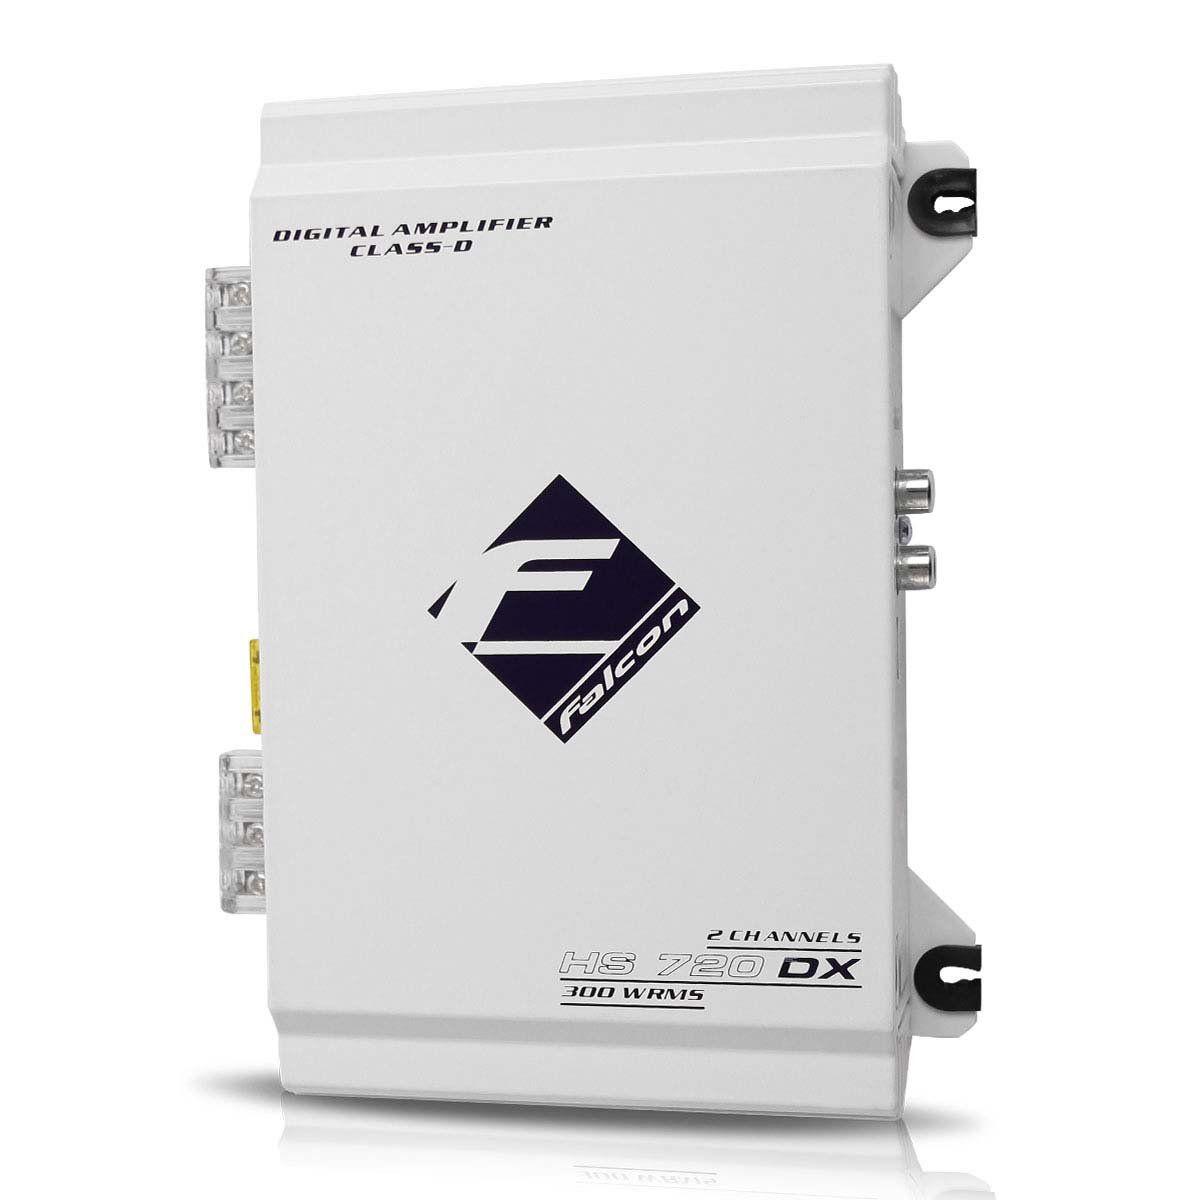 Módulo Amplificador Hs720 Dx Digital 300w Rms 2 Can Falcon